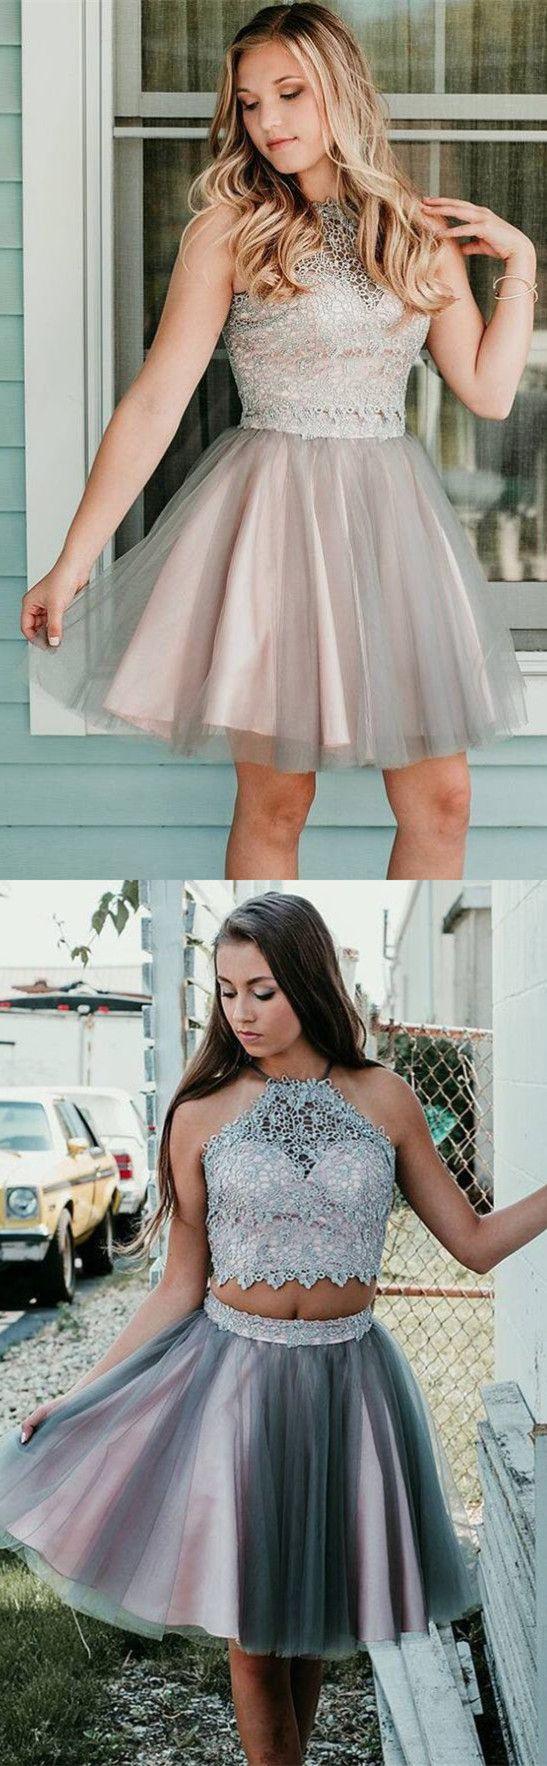 Princess two piece short homecoming dresses short homecoming